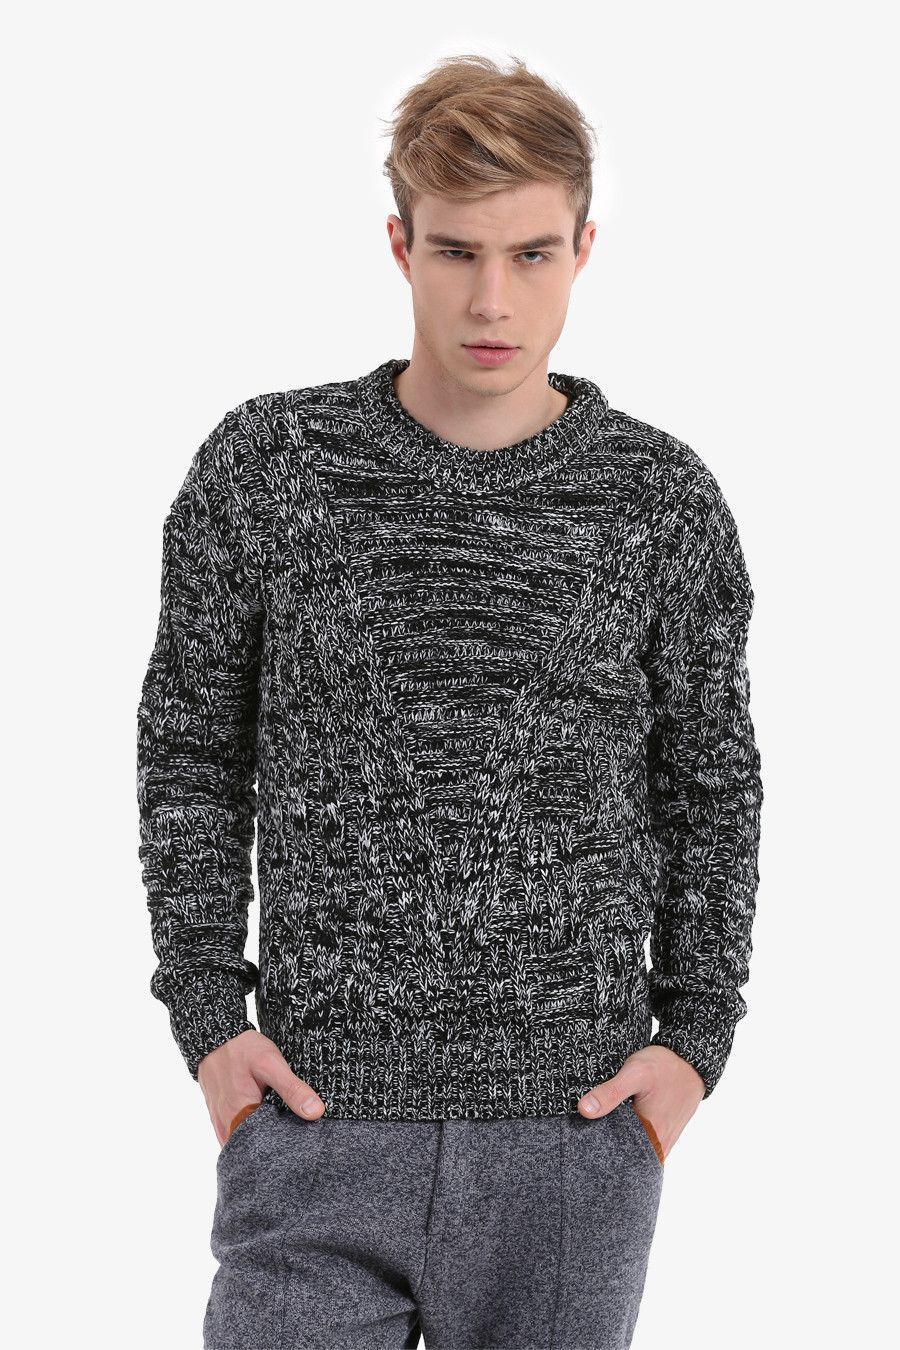 Men's Textured Gray Sweater